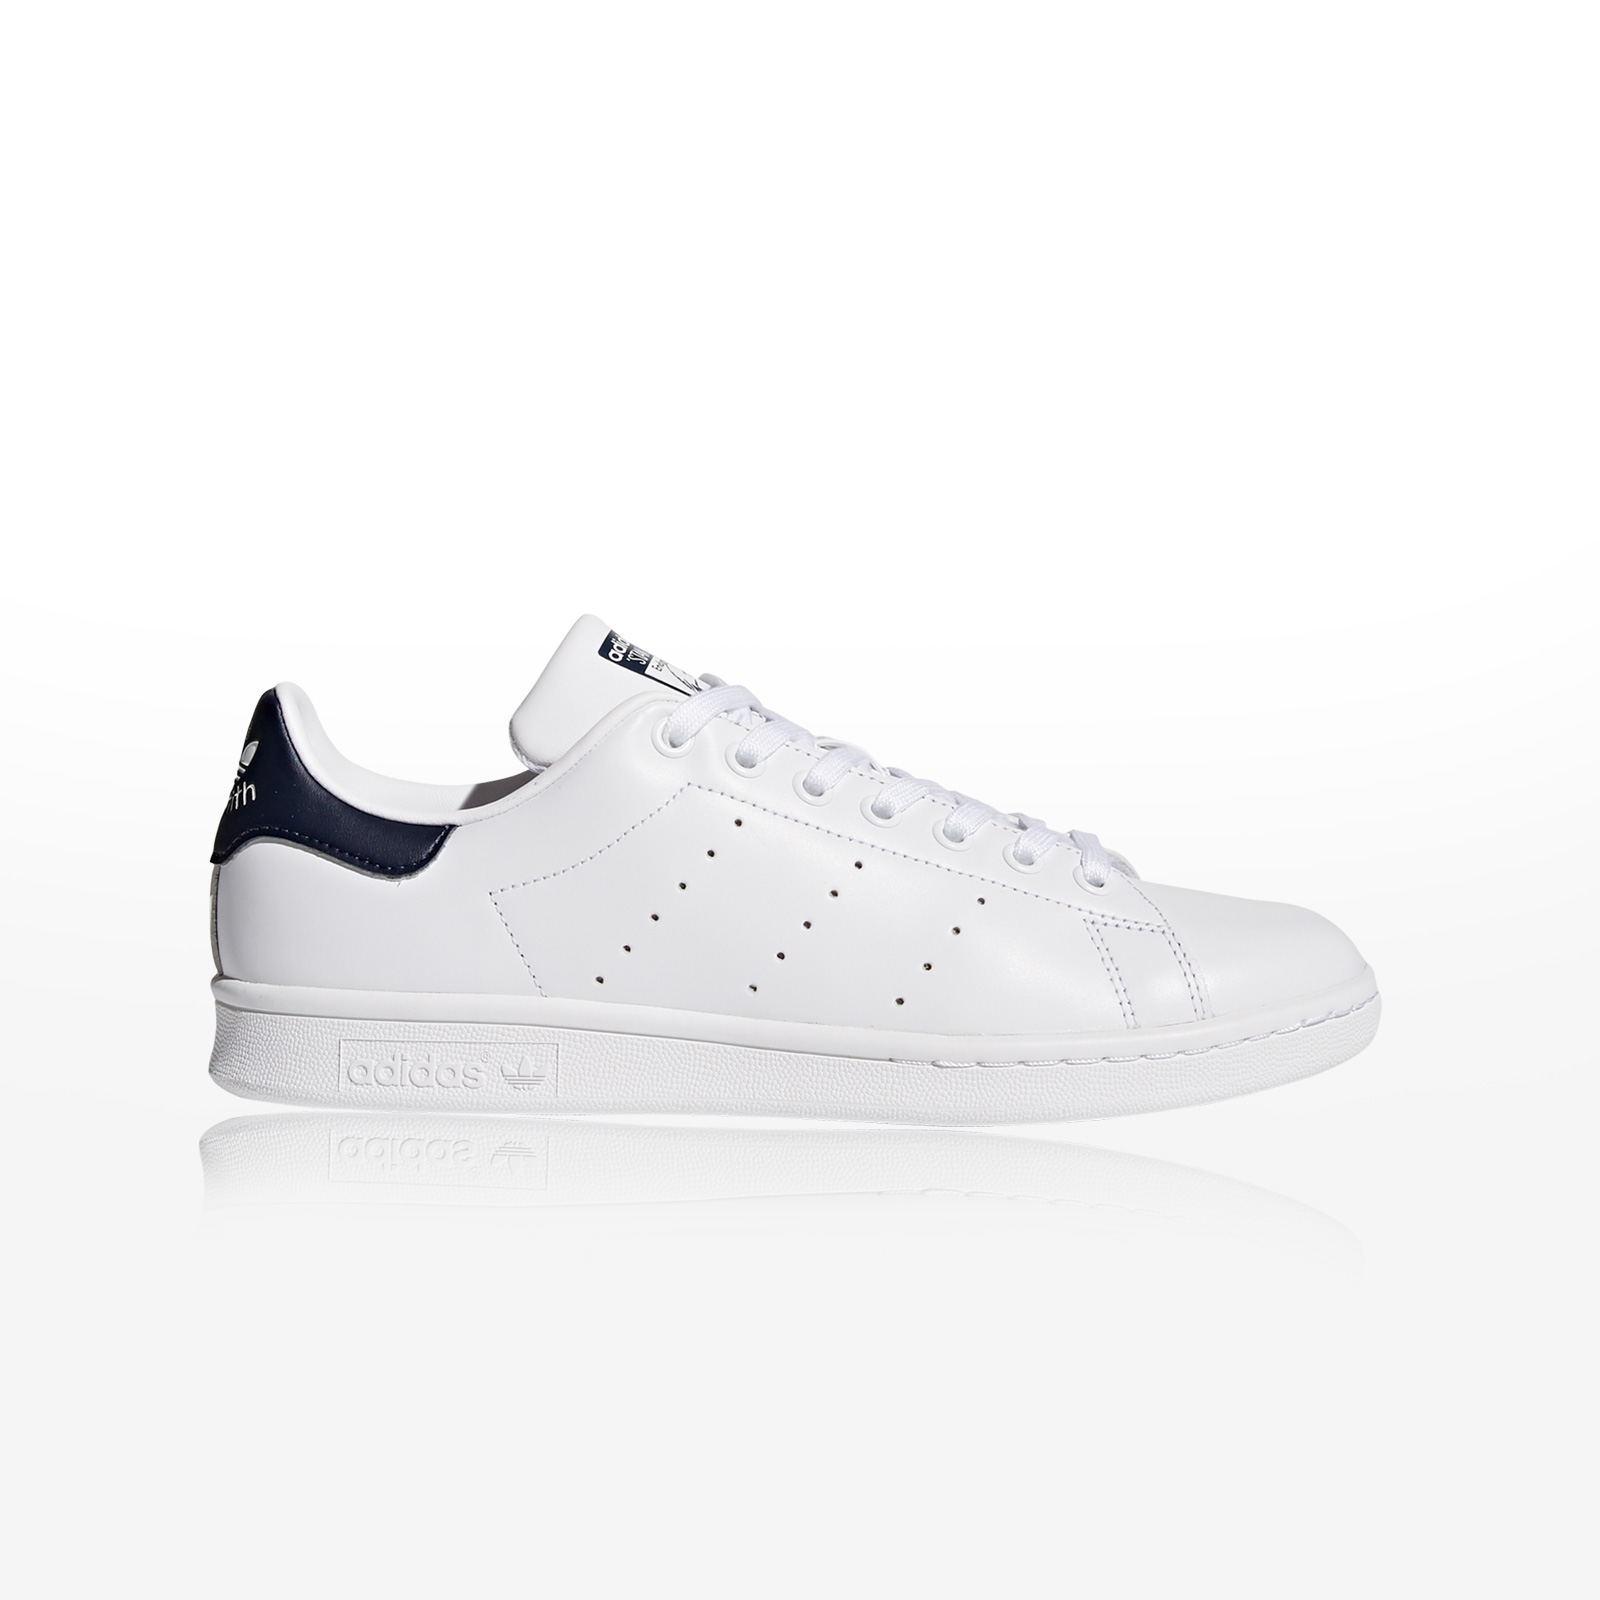 detailing new collection beauty Παπούτσια ADIDAS ORIGINALS - EXEM SHOES